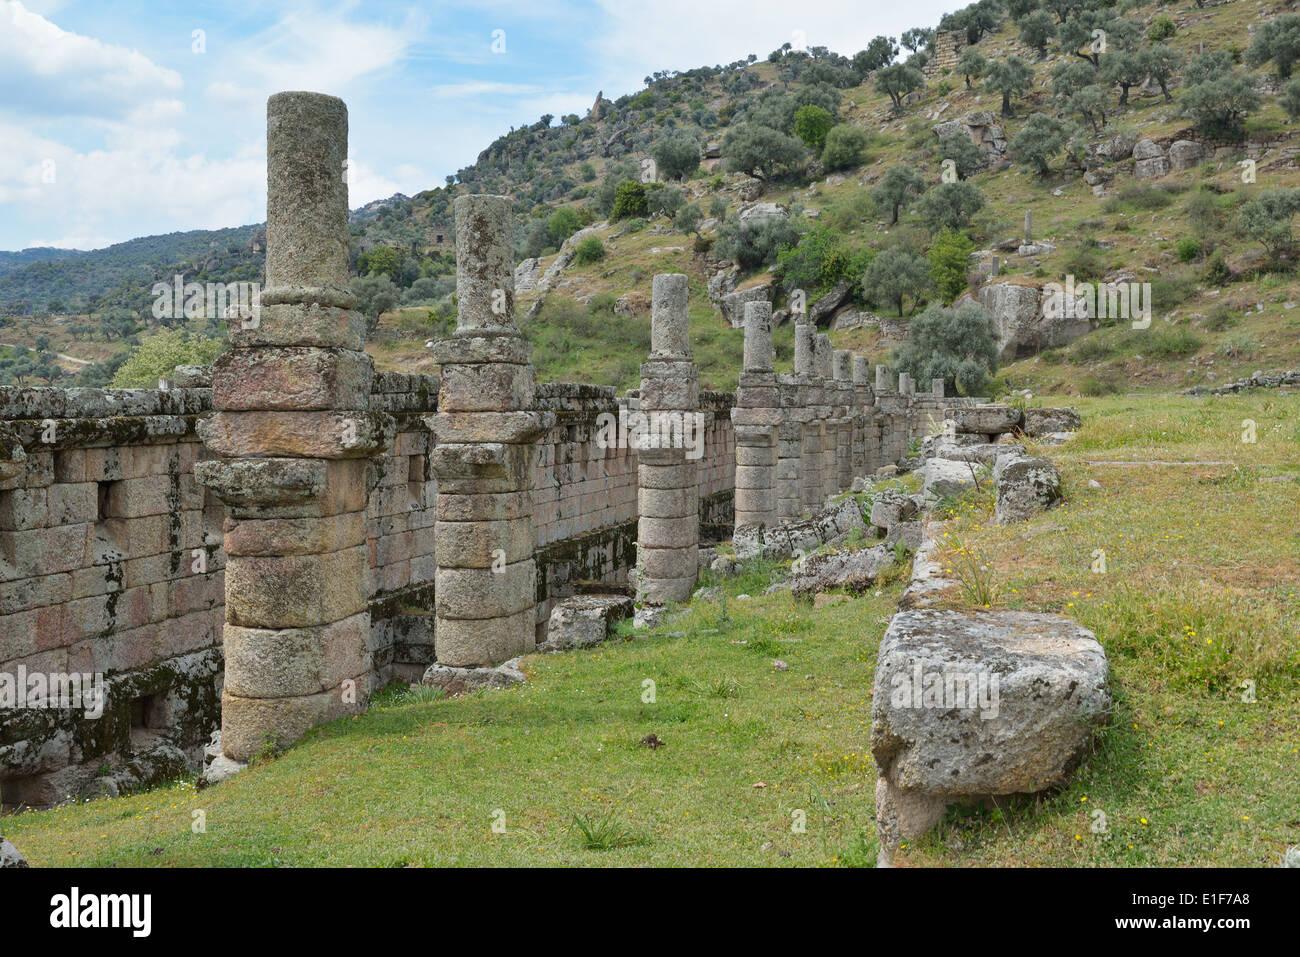 Three-story Hellenistic stoa, Alinda, Turkey 140416_60828 - Stock Image